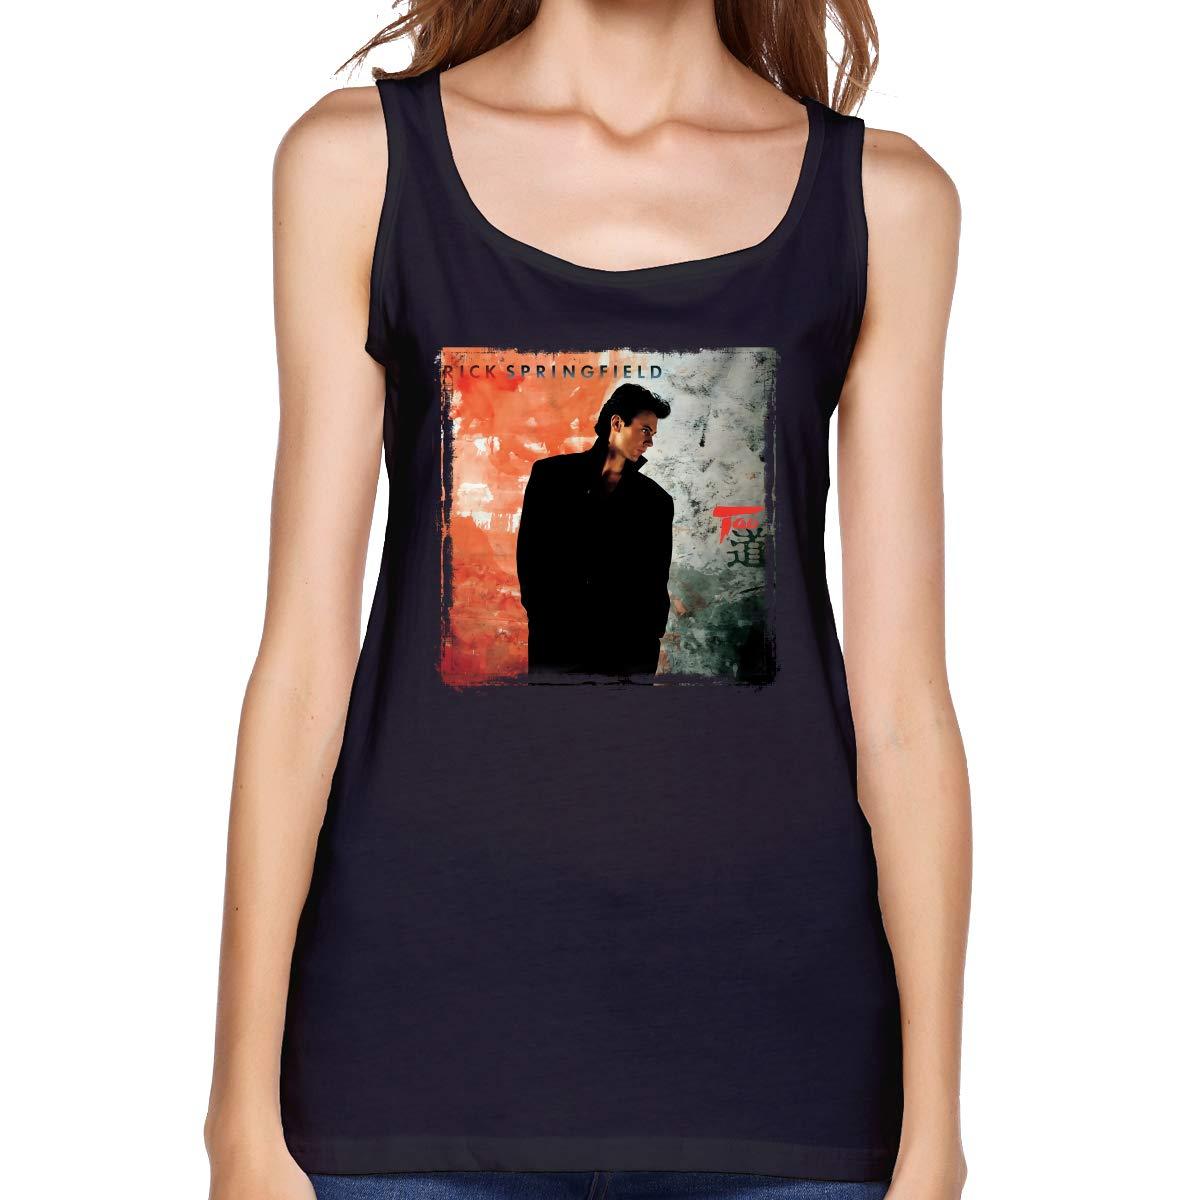 Rick Springfield Tao Sportswear Yoga Tank Top Shirt 7148